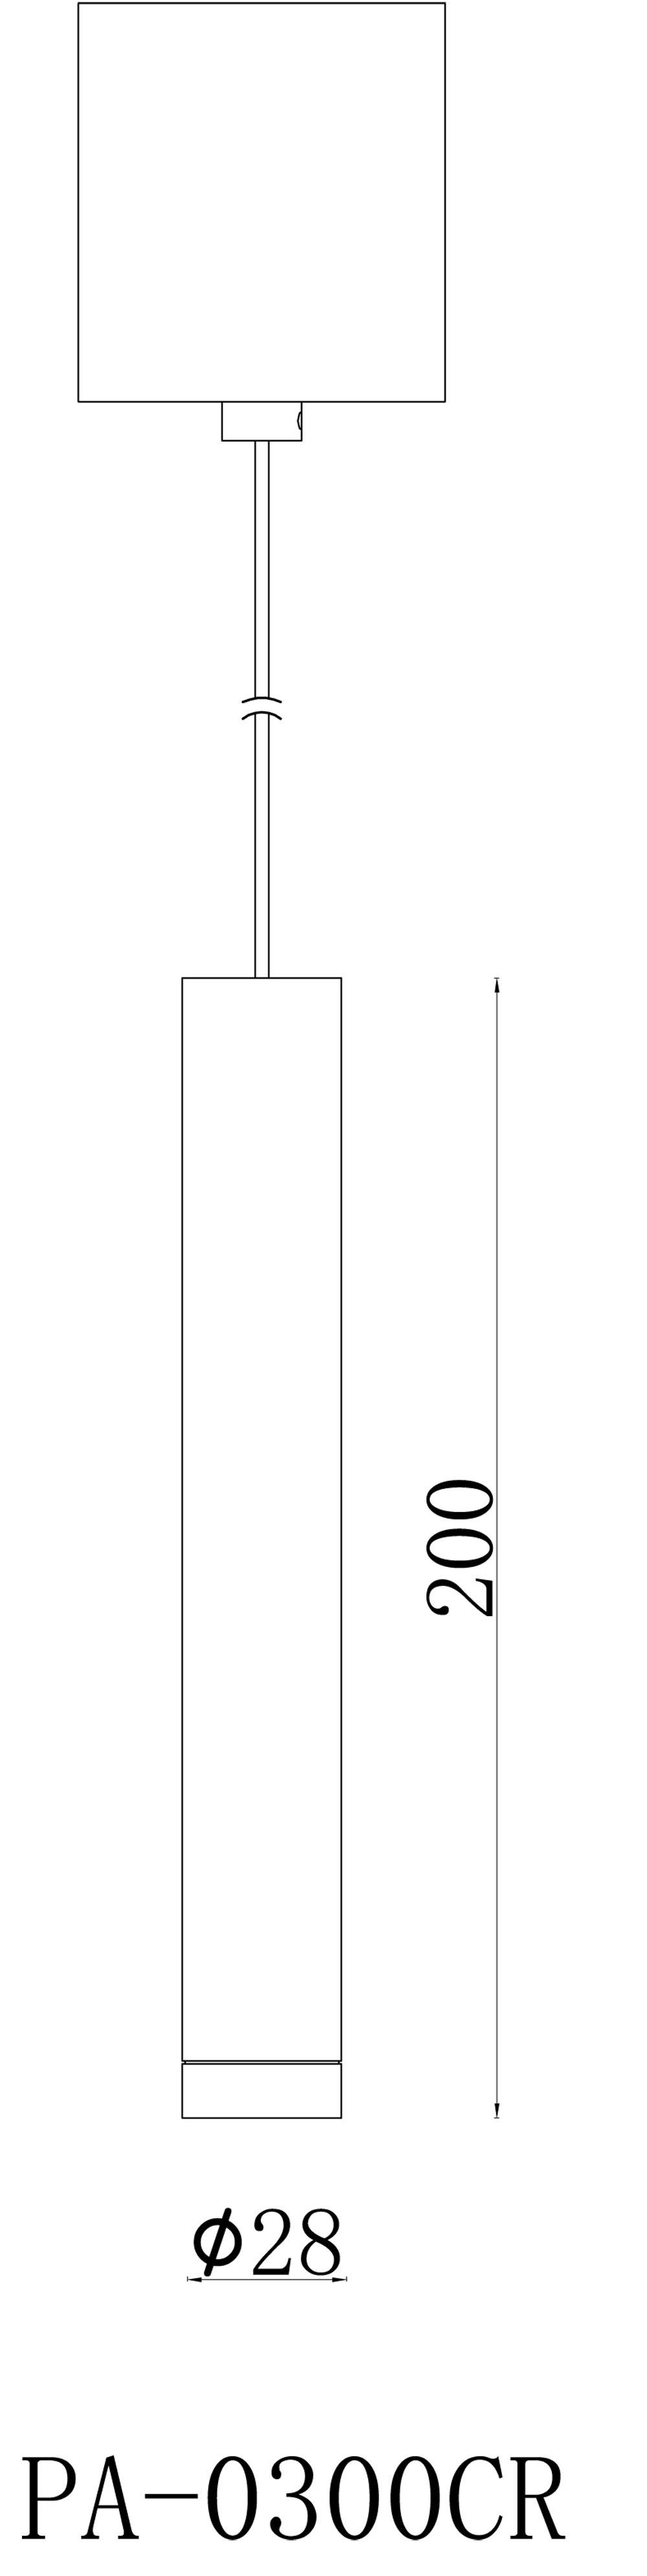 PA-0300CR-尺寸图.jpg